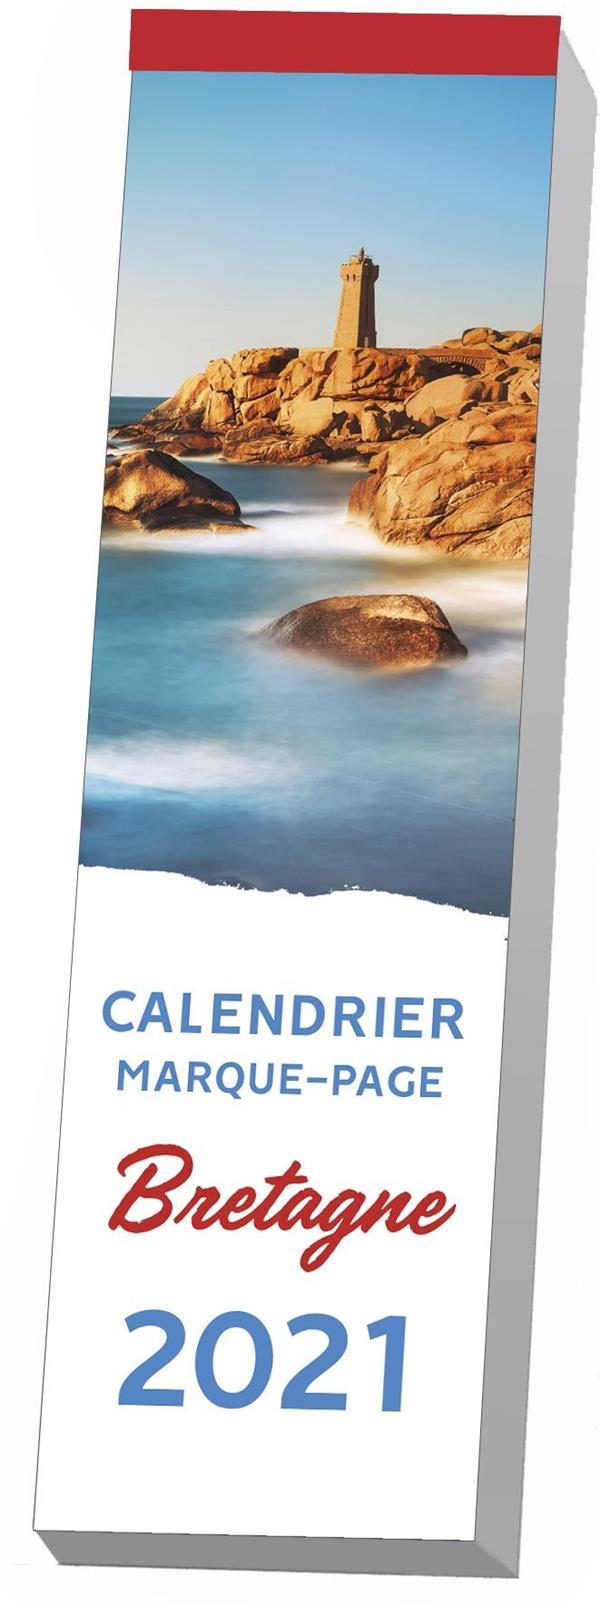 calendrier marque-page ; Bretagne (édition 2021)